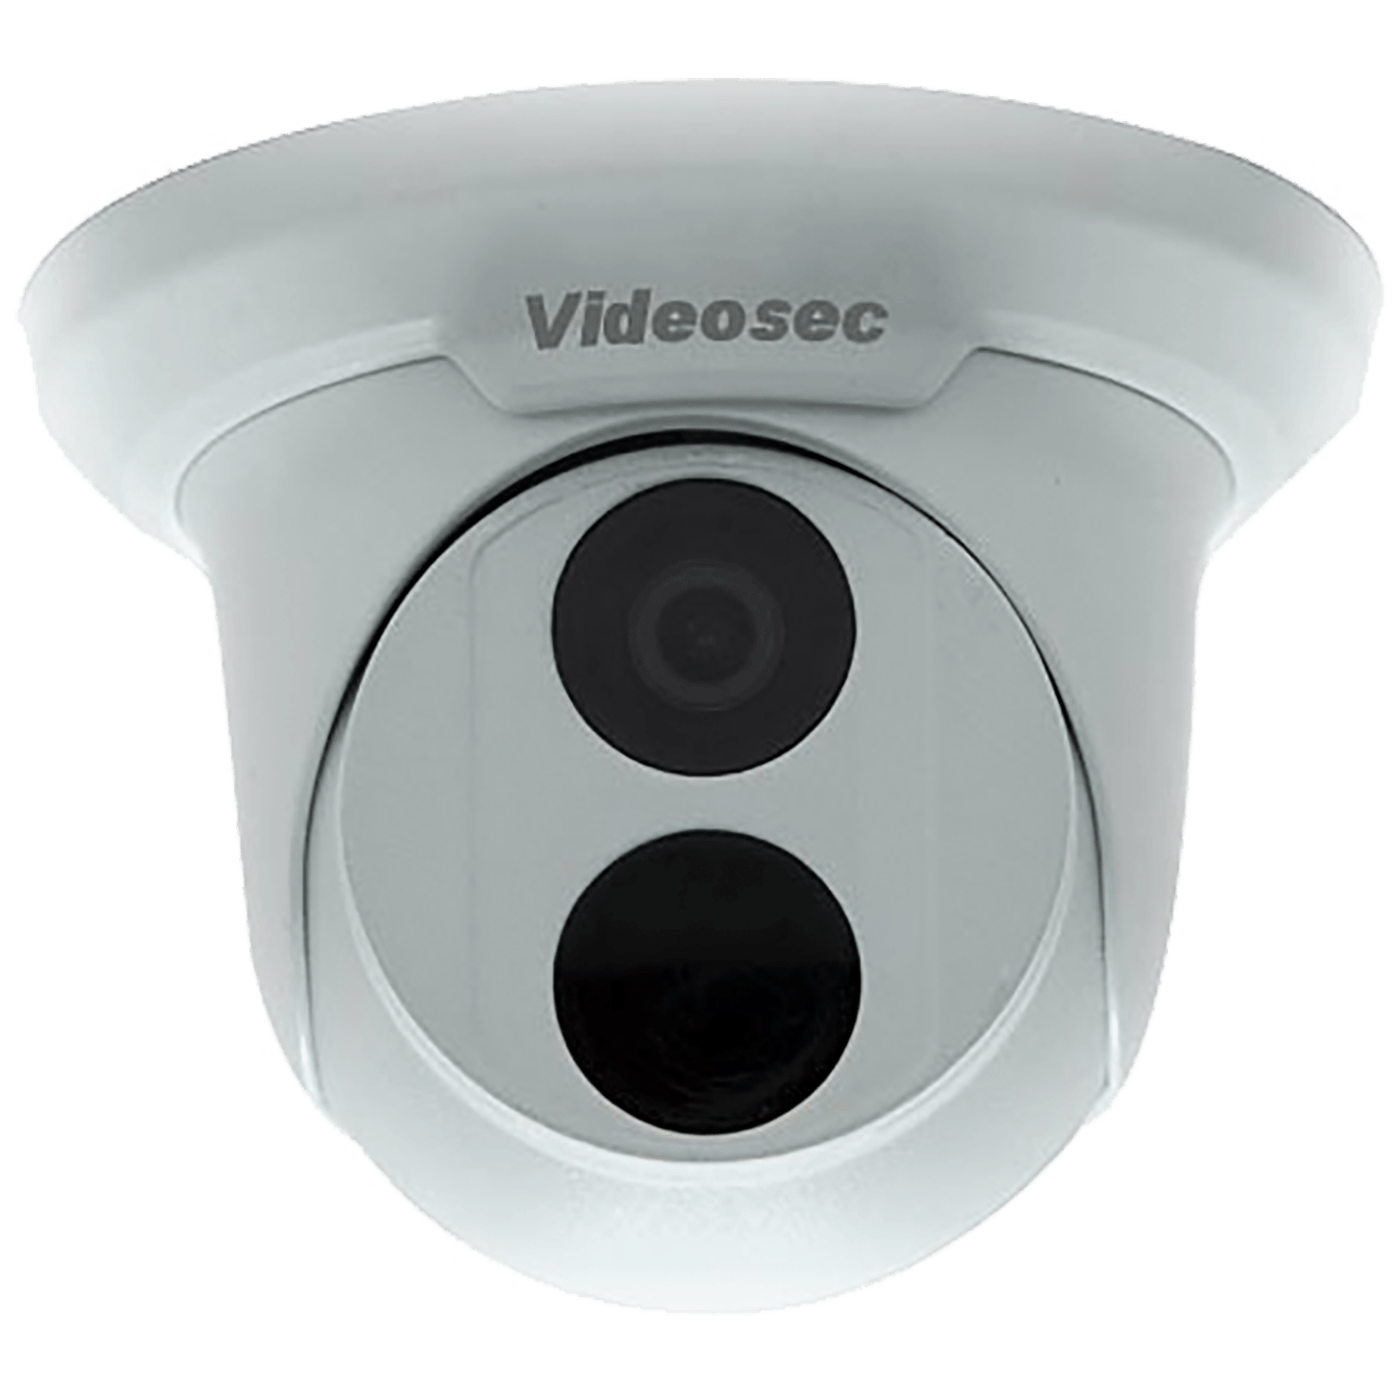 Videosec - IPD-3612-28MC